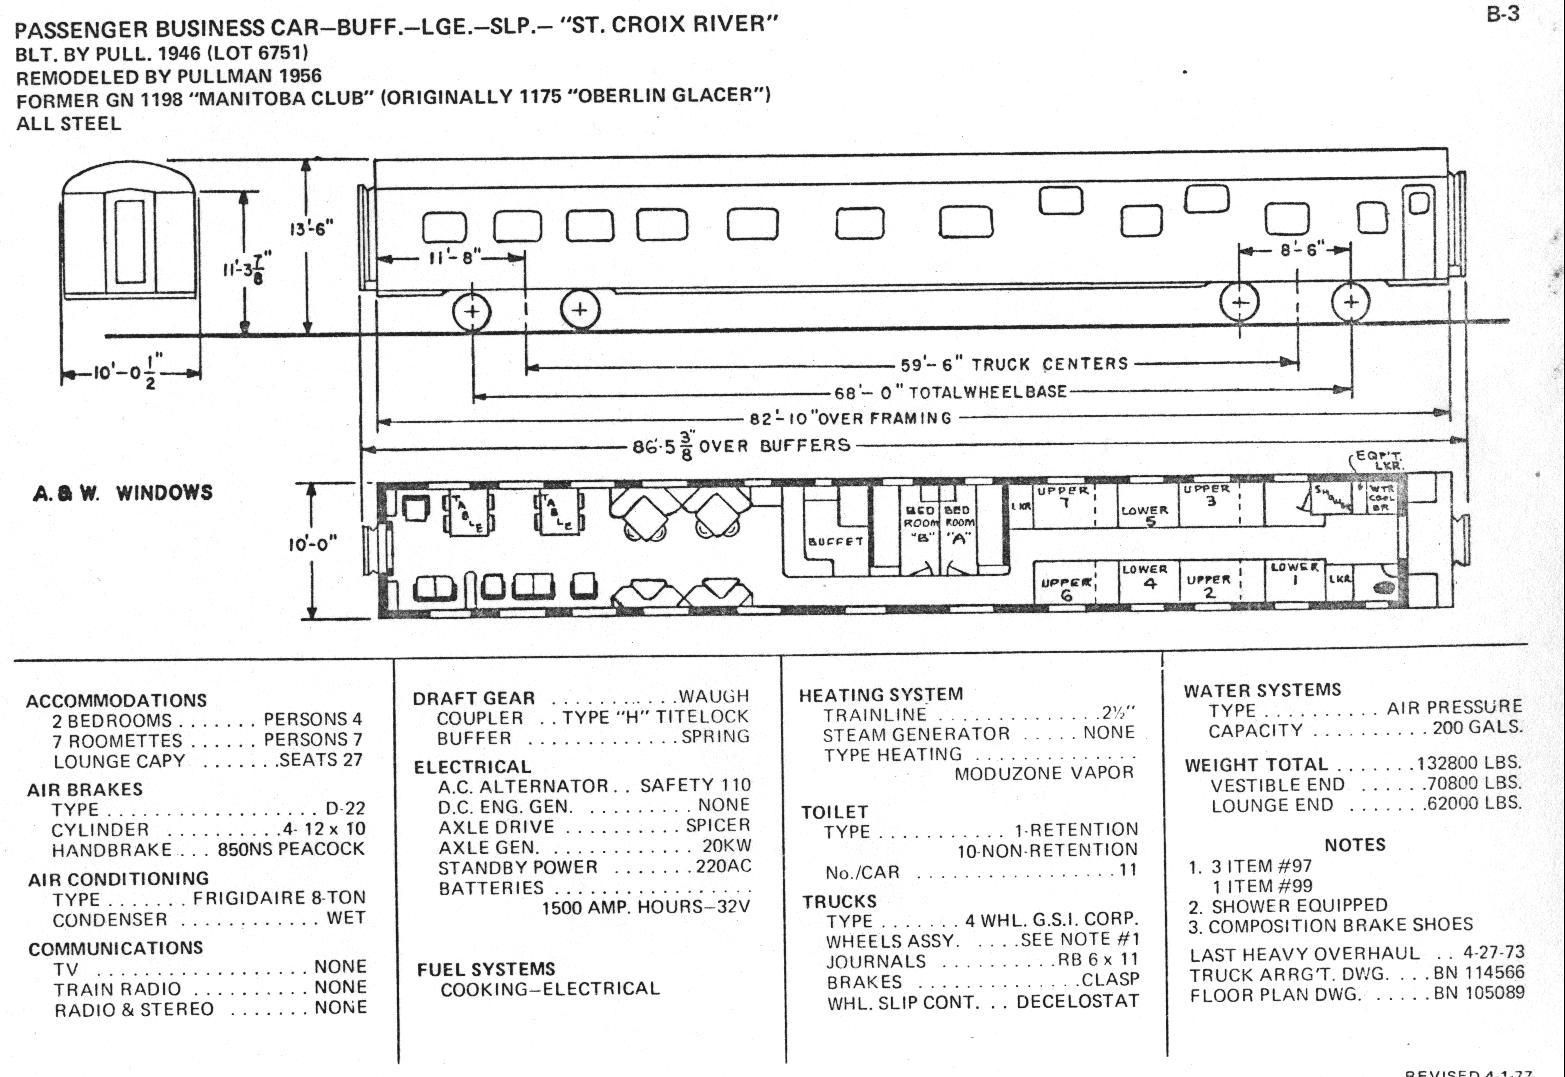 hight resolution of passenger car diagrams diy enthusiasts wiring diagrams 2000 mazda b2500 fuse diagram 1999 mazda b2000 fuel